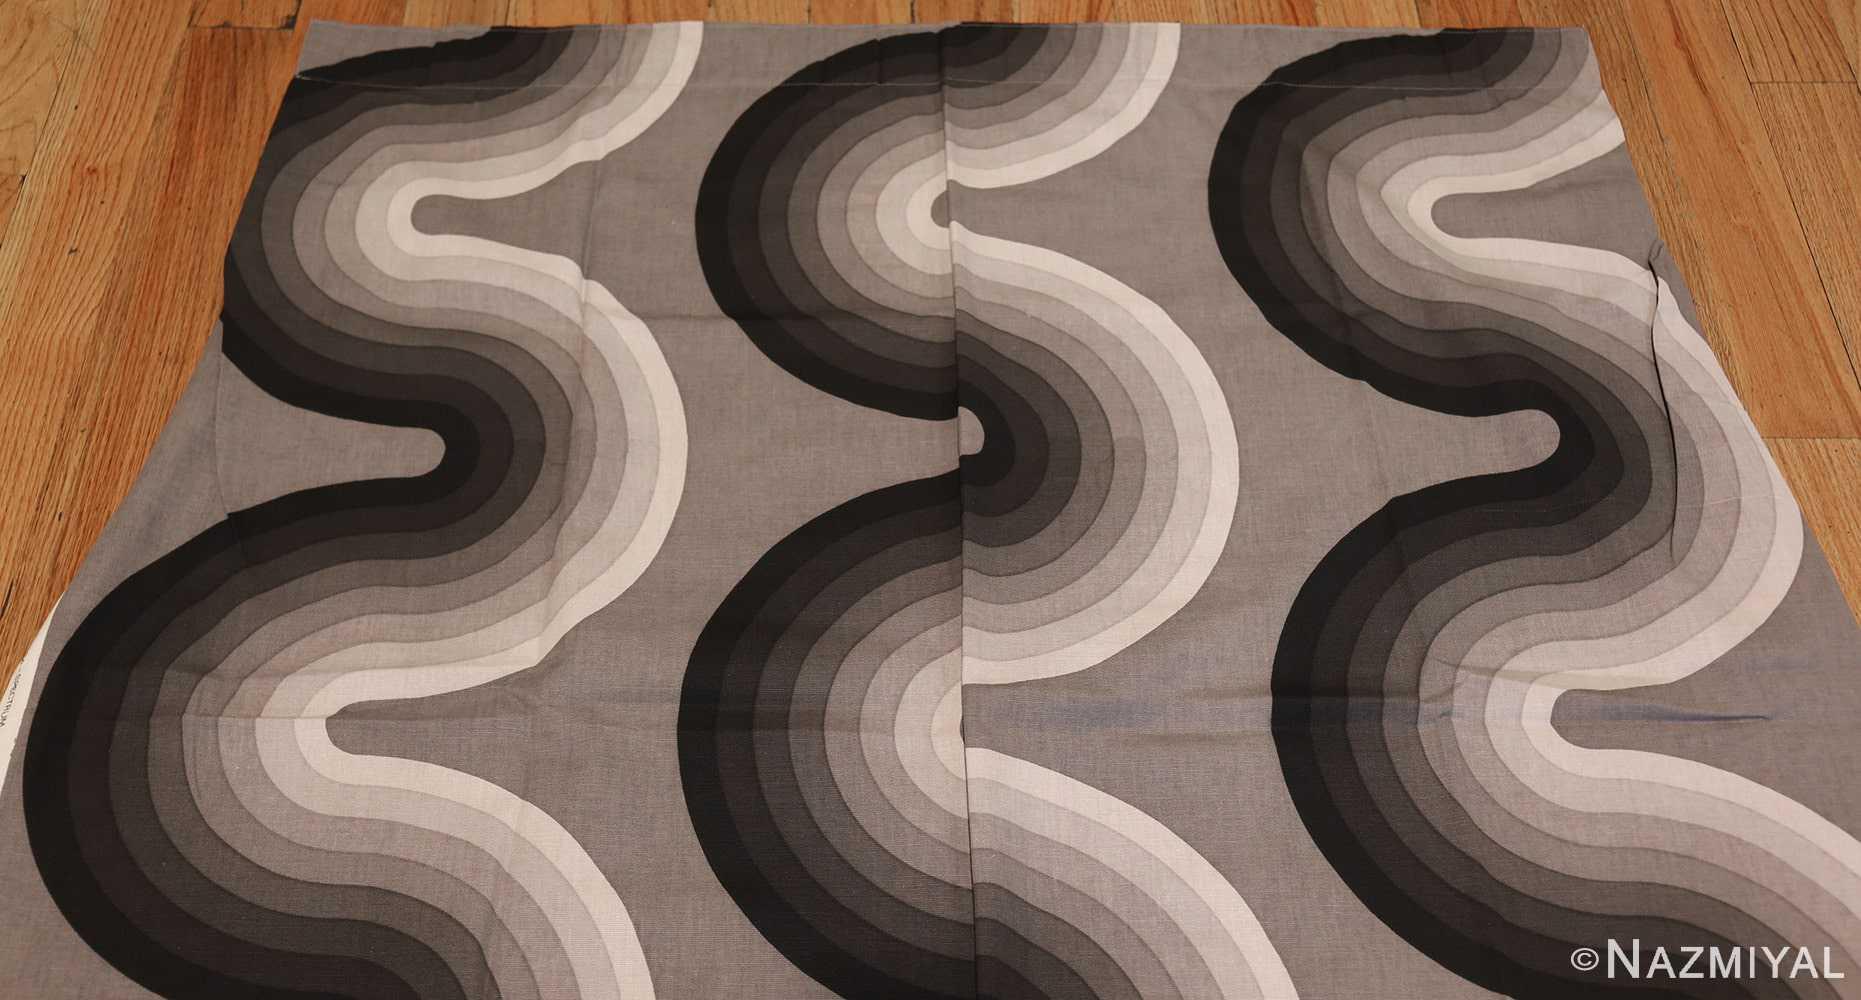 vintage kurve verner panton textile 47811 top Nazmiyal